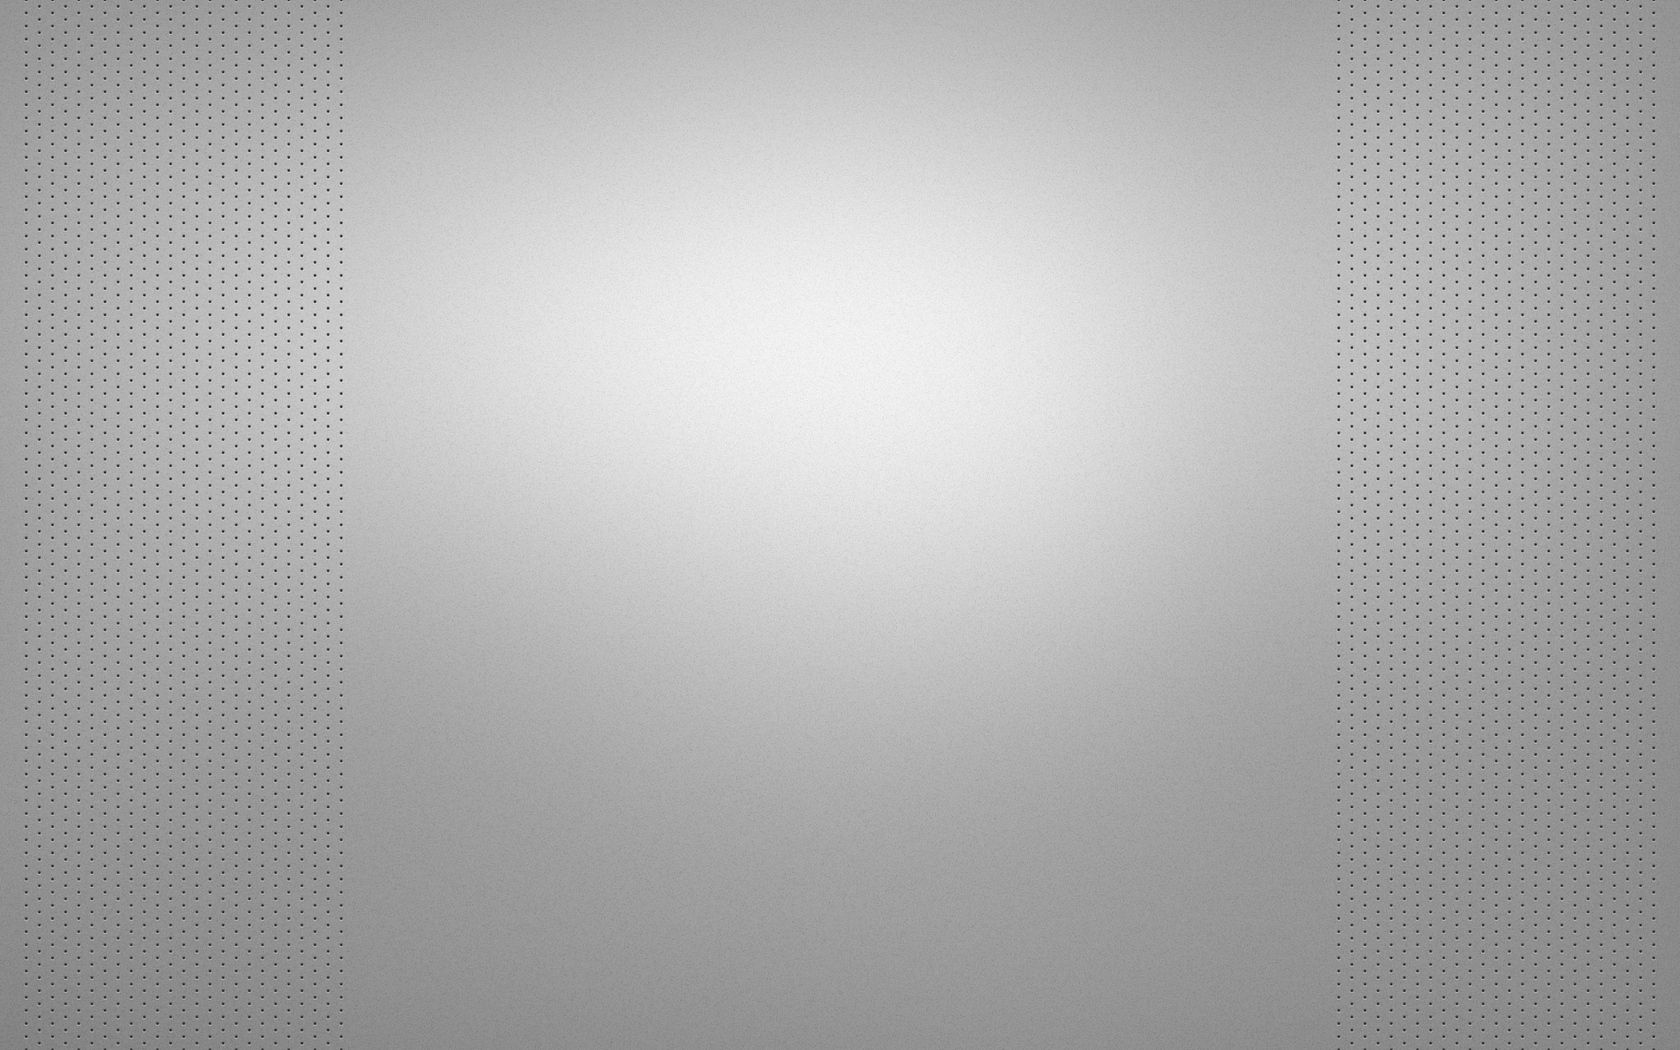 83652 descarga Gris fondos de pantalla para tu teléfono gratis, Texturas, Textura, De Color Claro, Luz, Fondo, Puntos, Punto, Perforación Gris imágenes y protectores de pantalla para tu teléfono